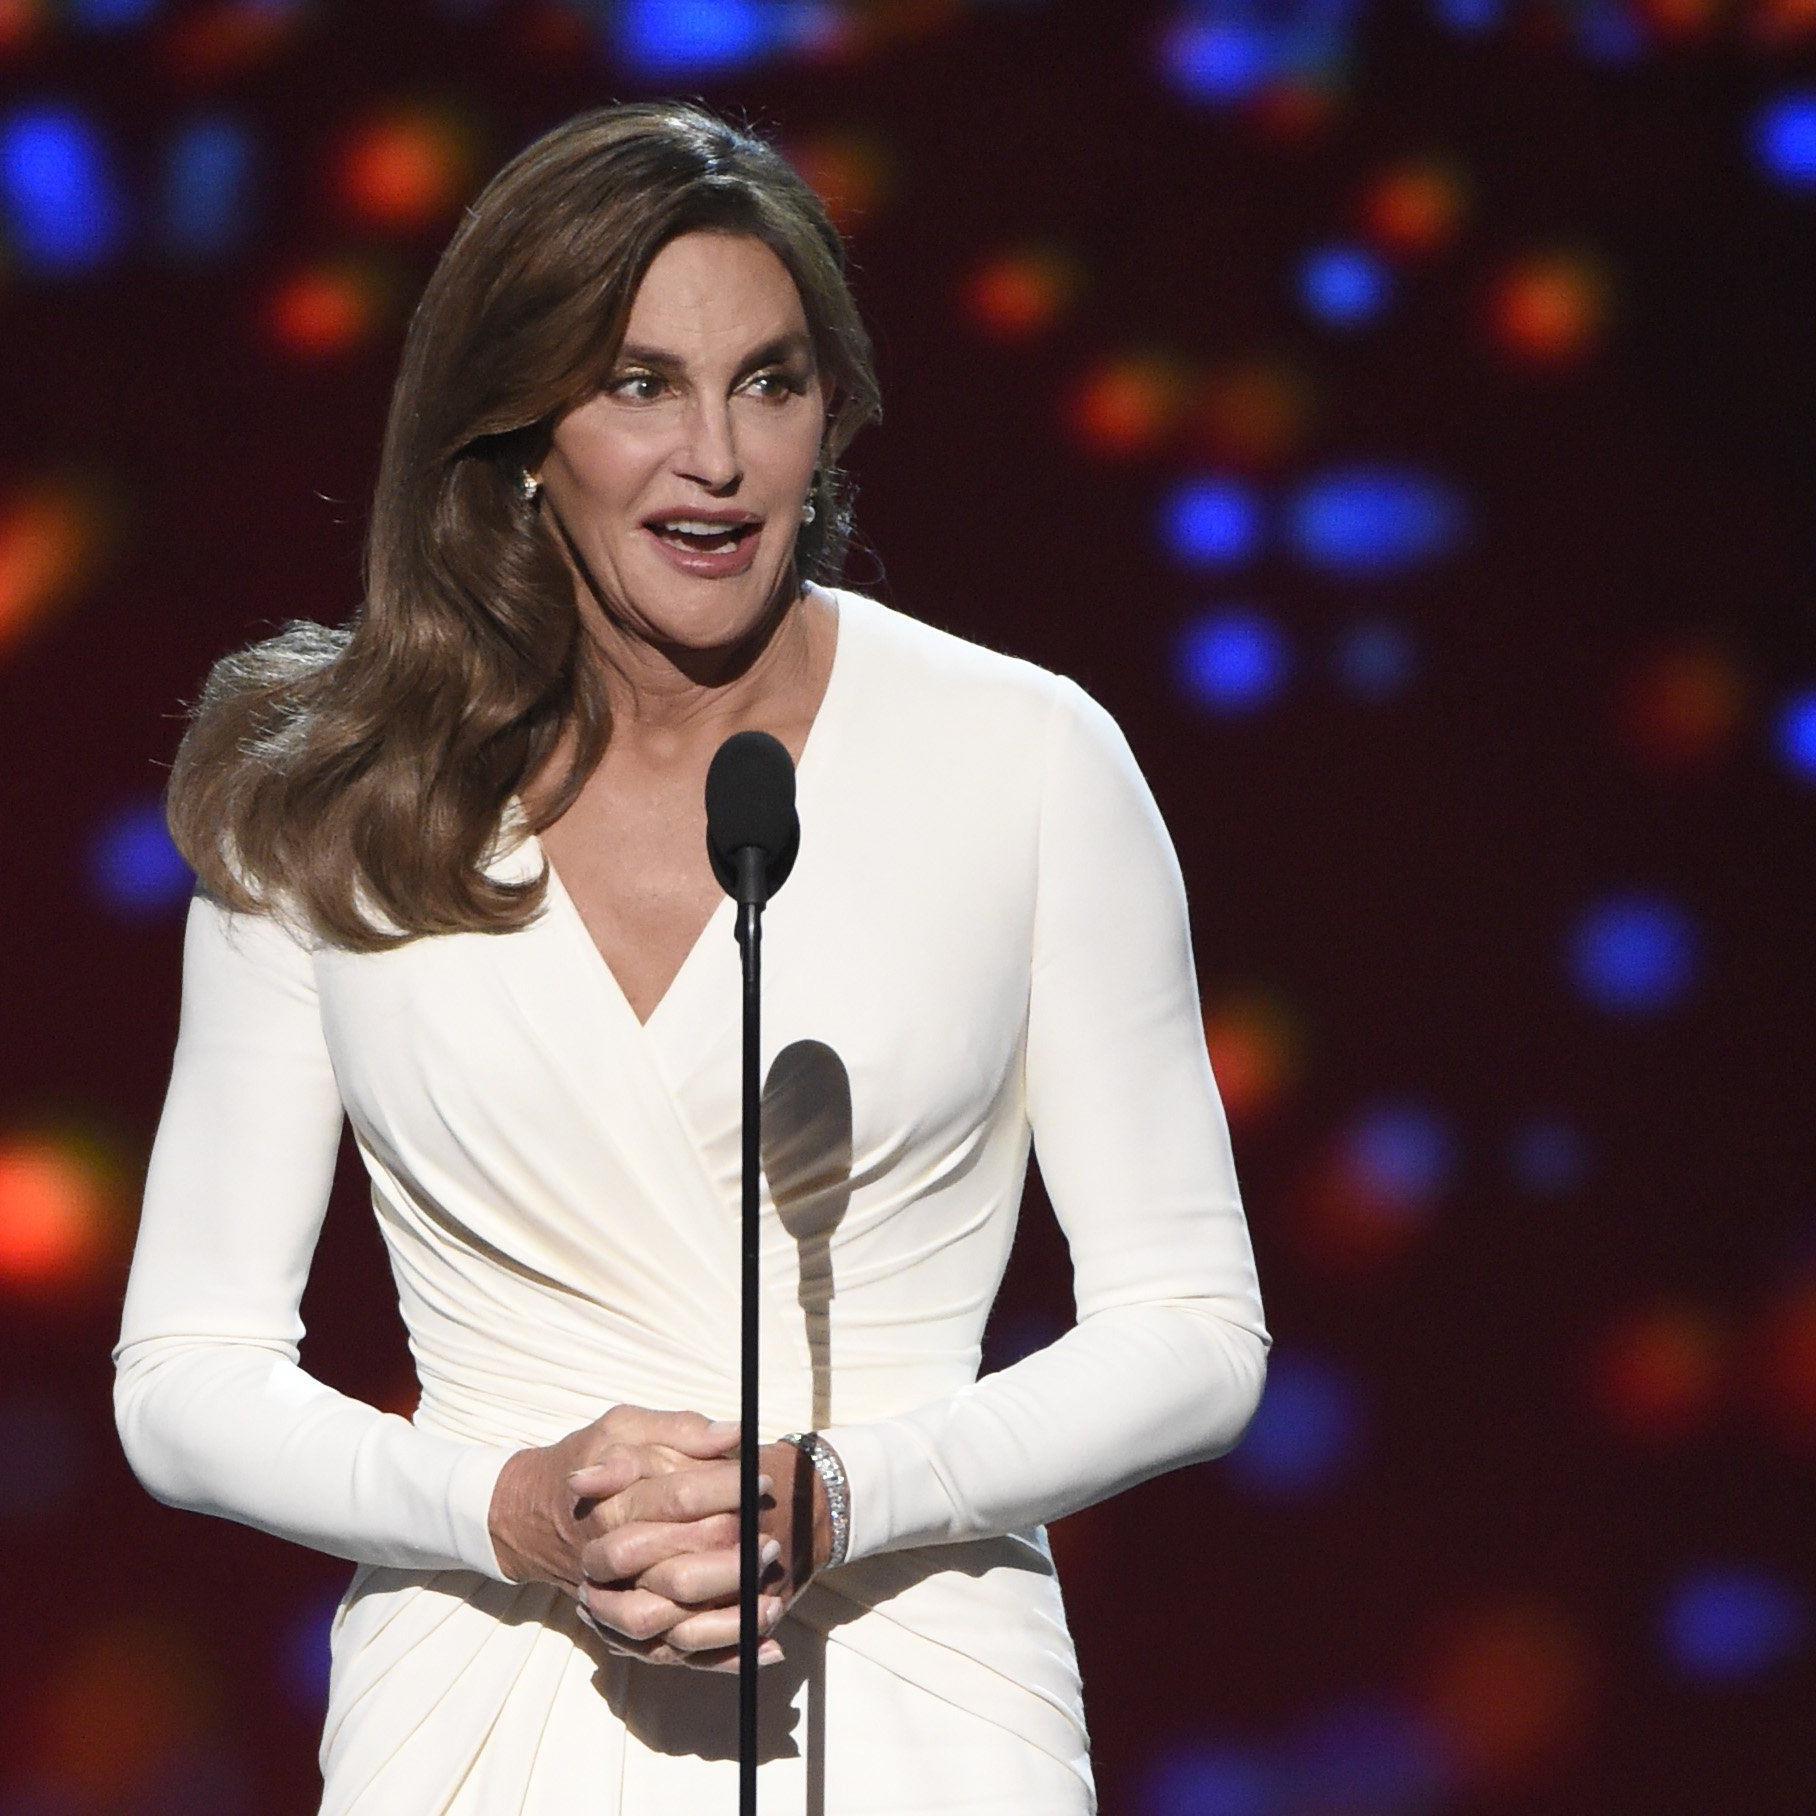 Caitlyn Jenner erhielt Preis für Mut